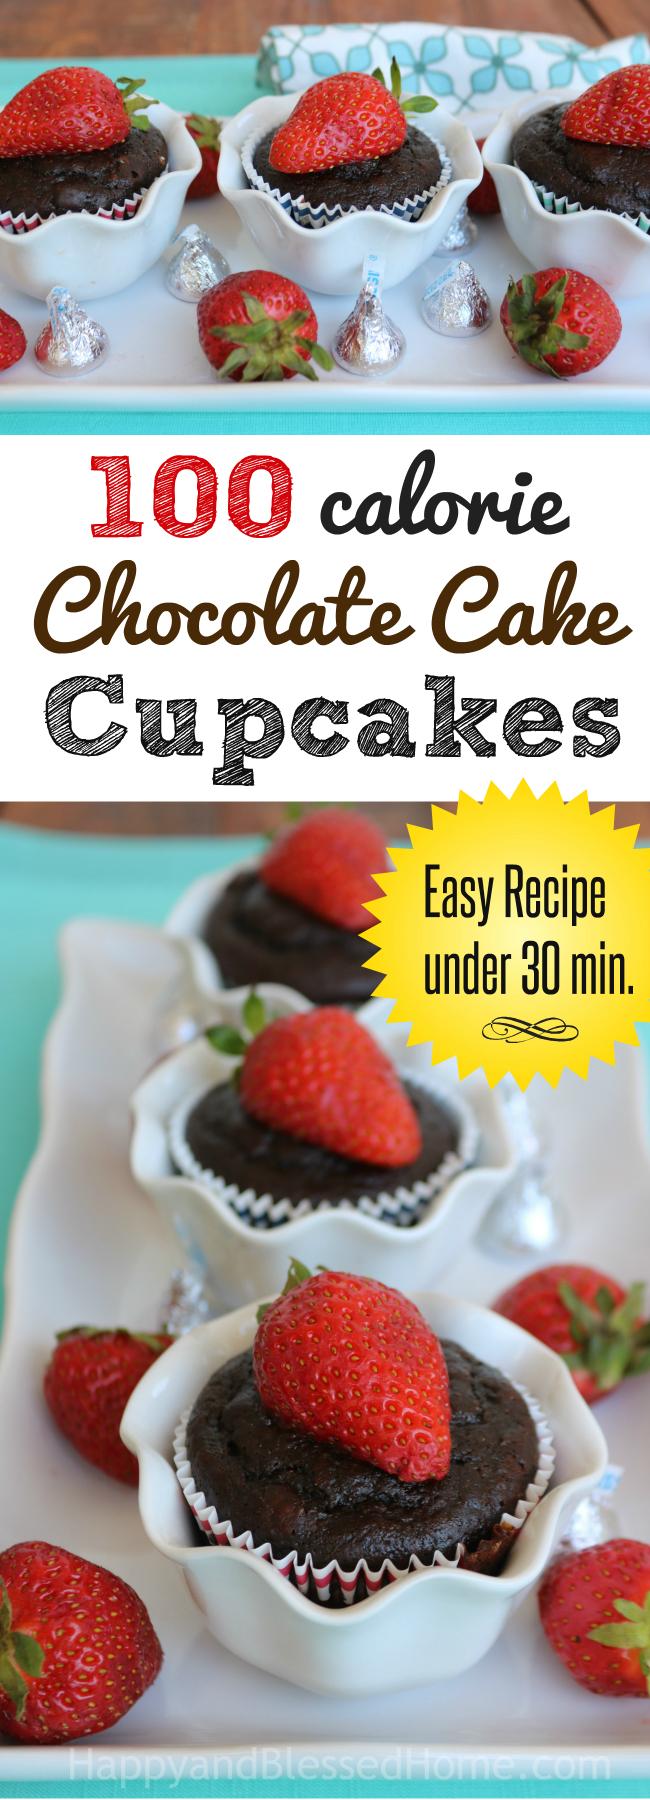 100 Calorie Chocolate Cake Cupcakes Recipe